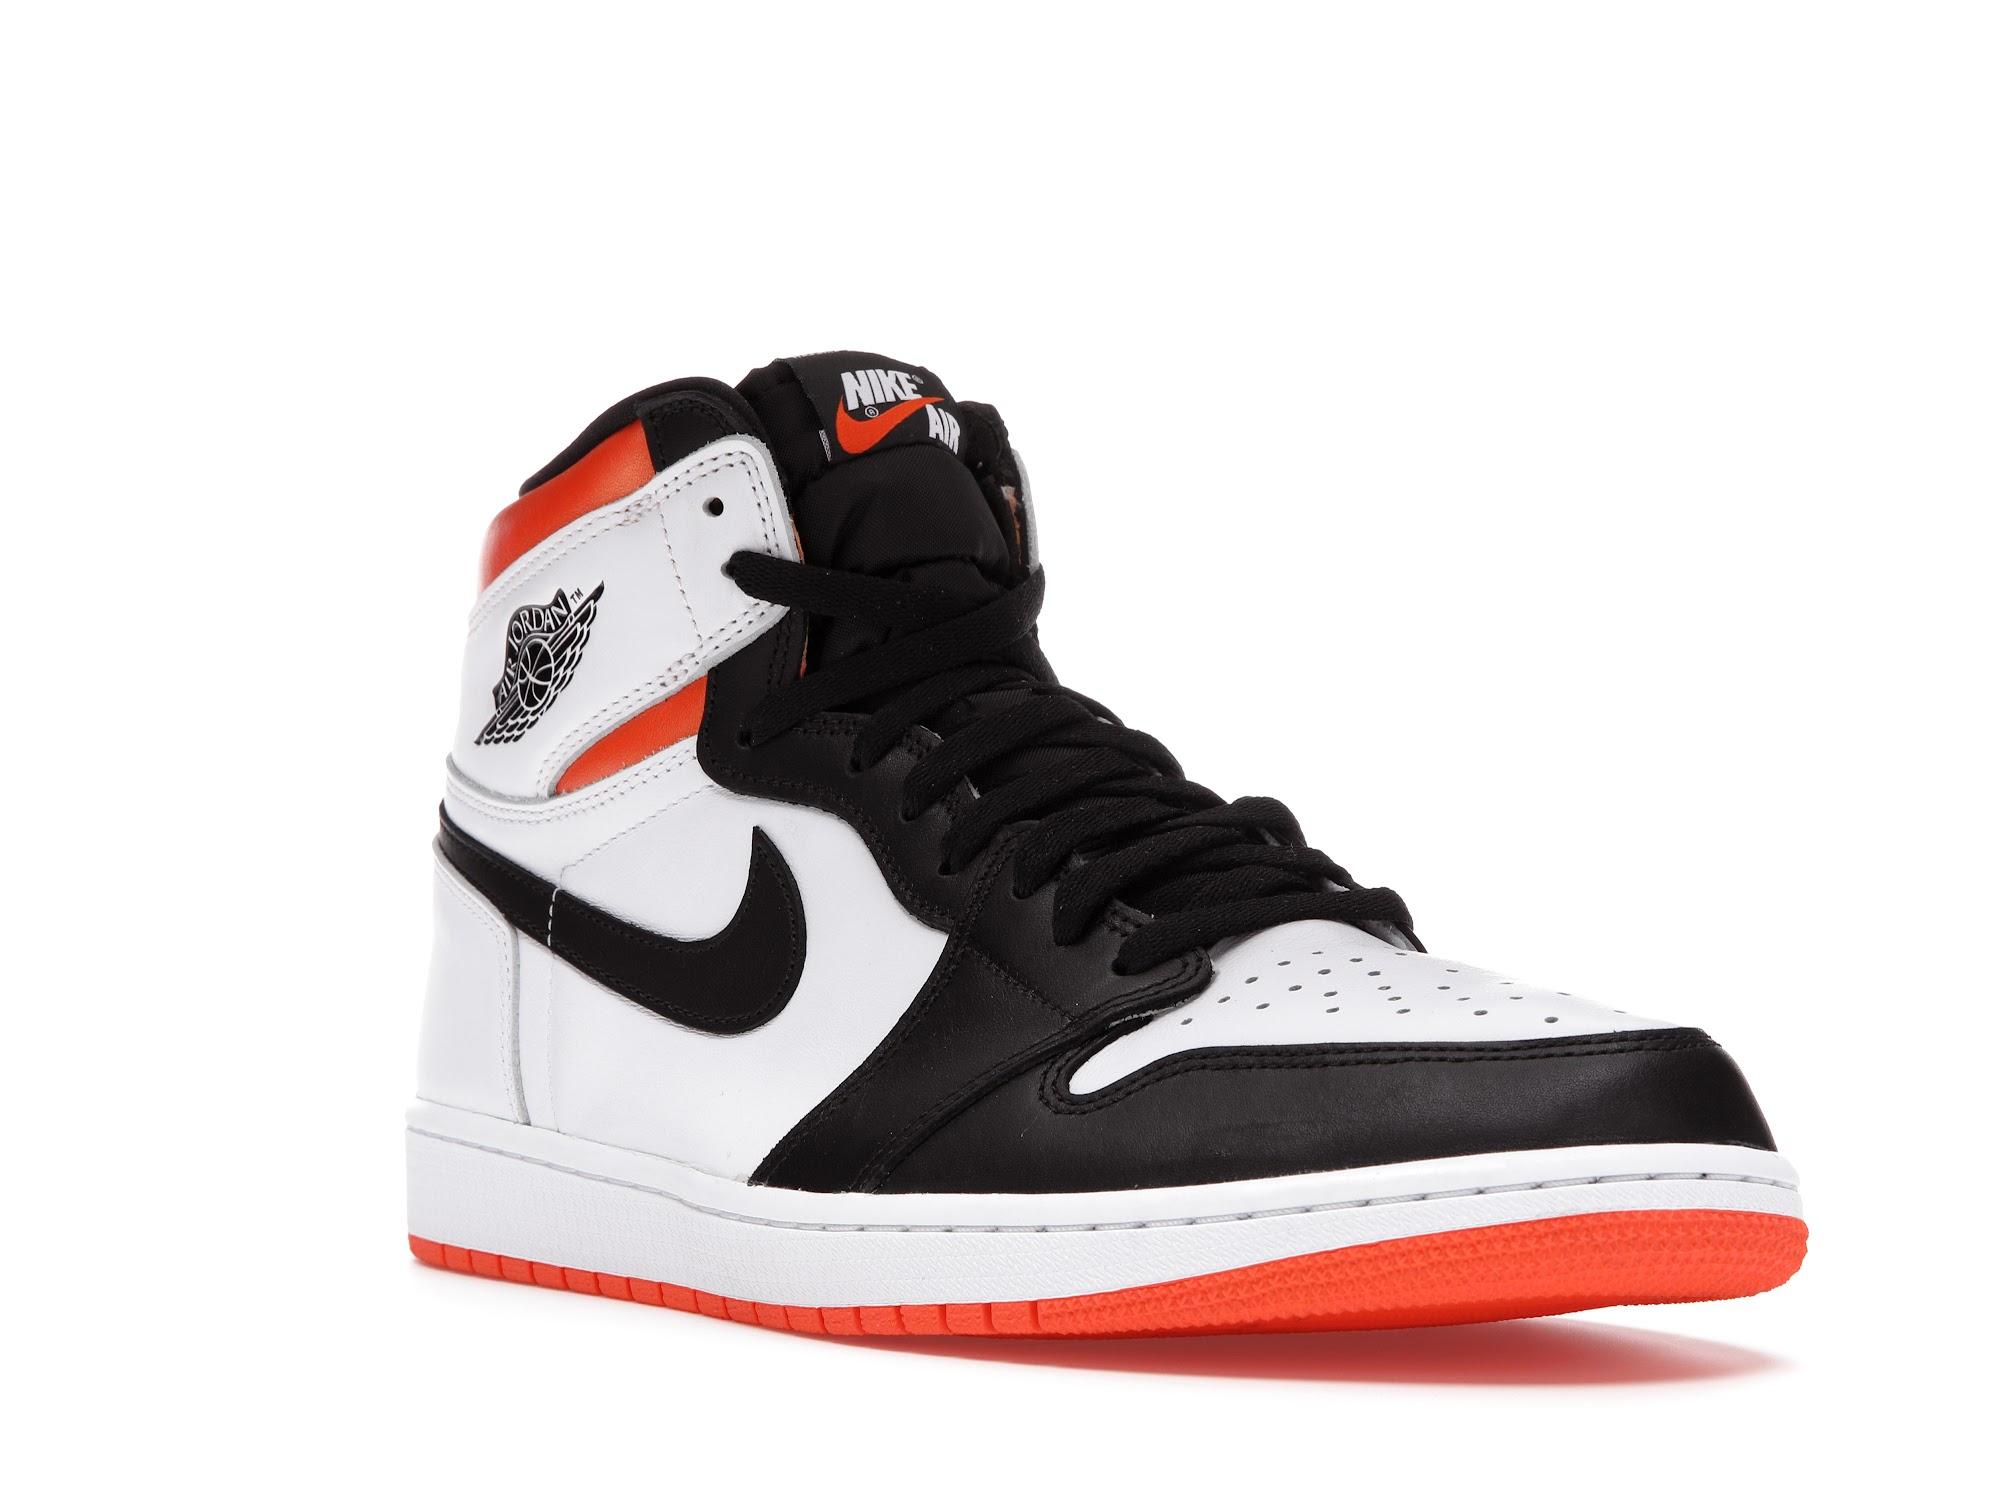 Jordan 1 Retro High Electro Orange - 555088-180